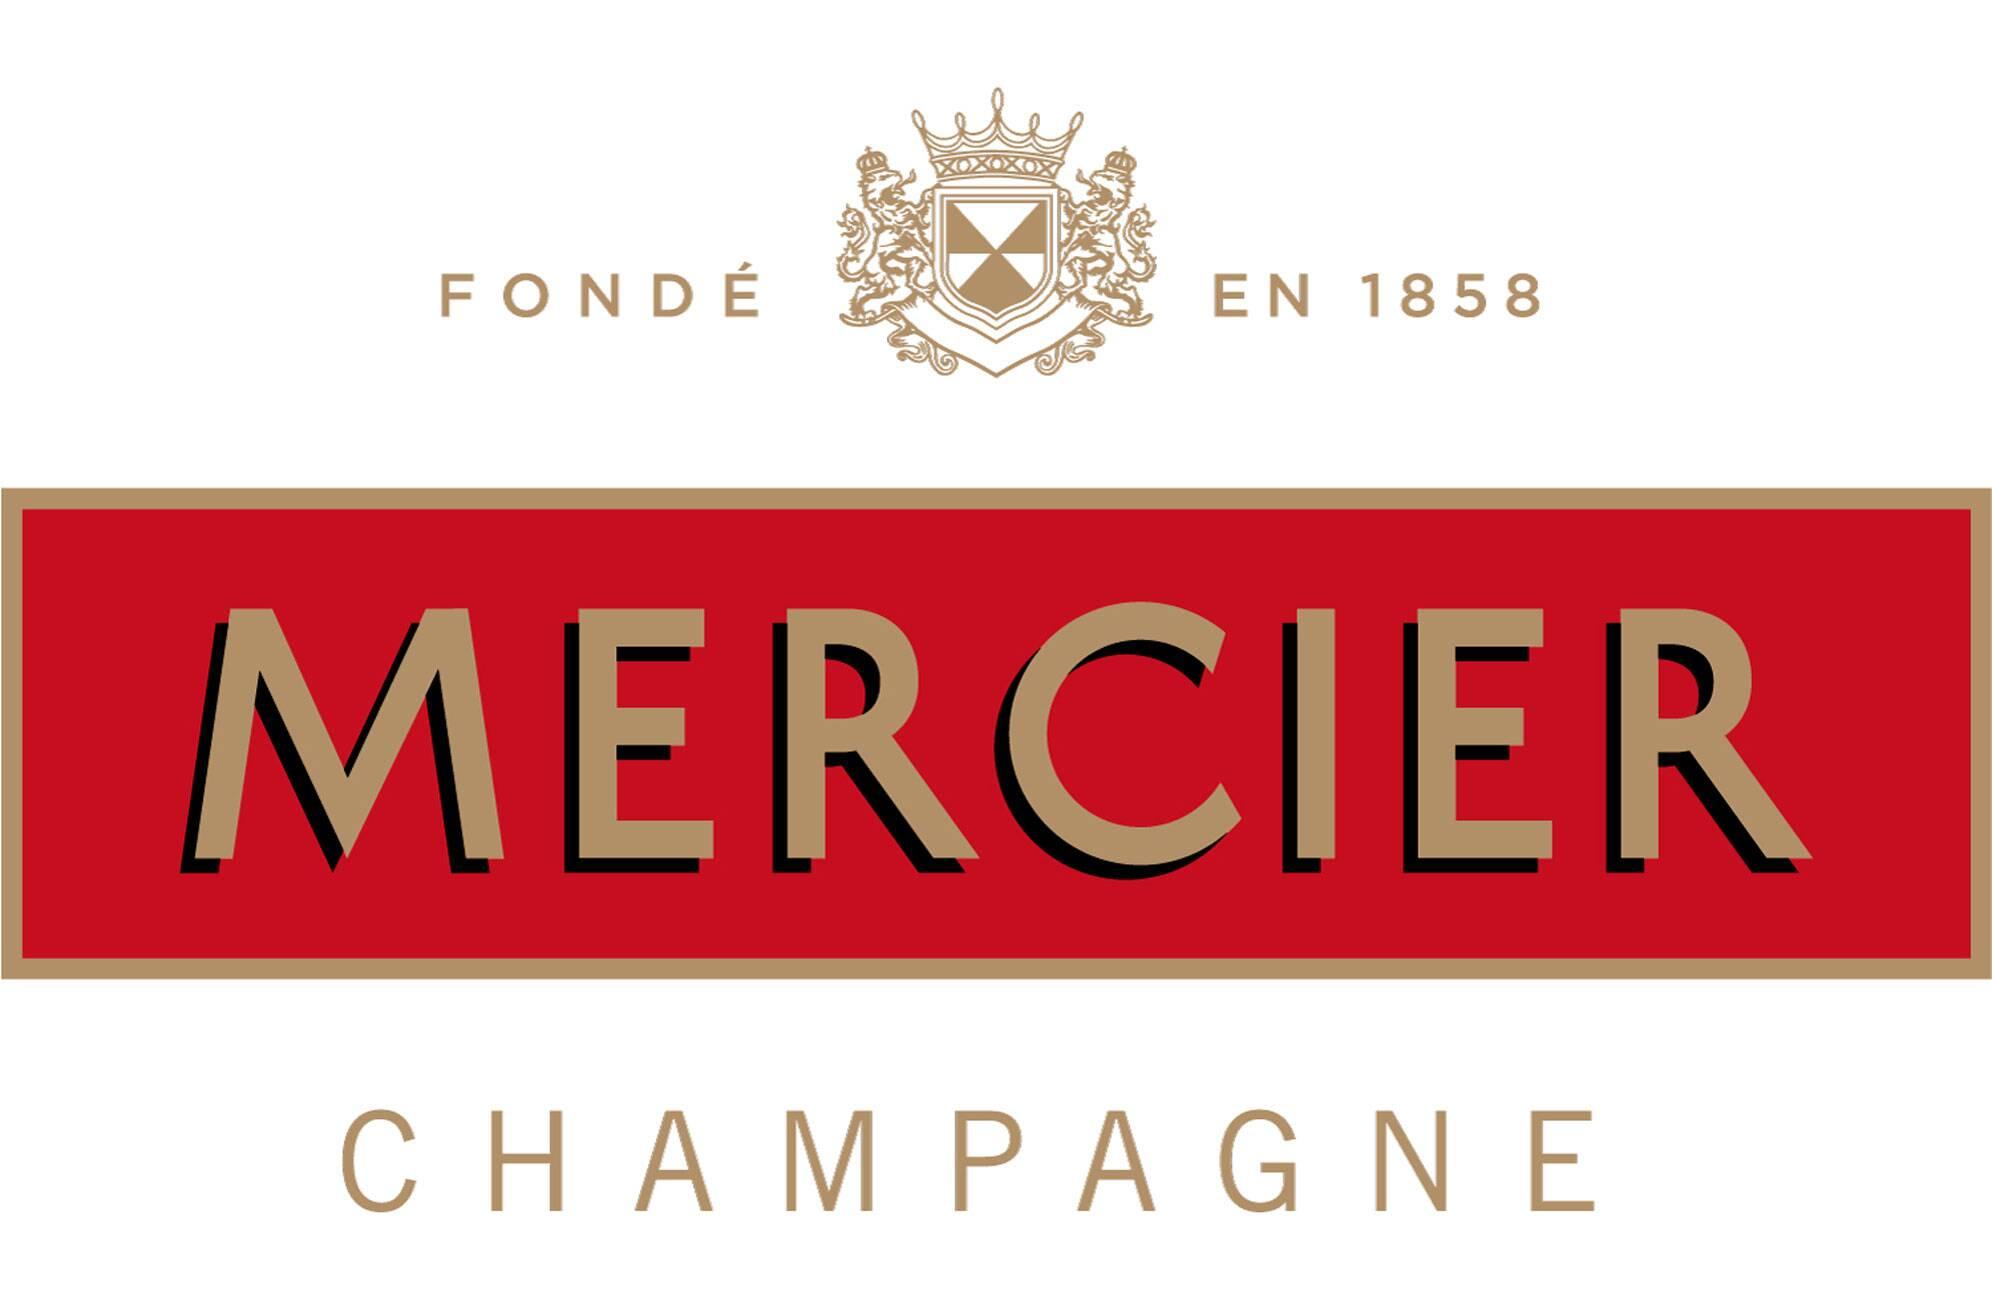 Smuk Mercier, champagne, Champagne traditions - Wines & Spirits - LVMH QO-03